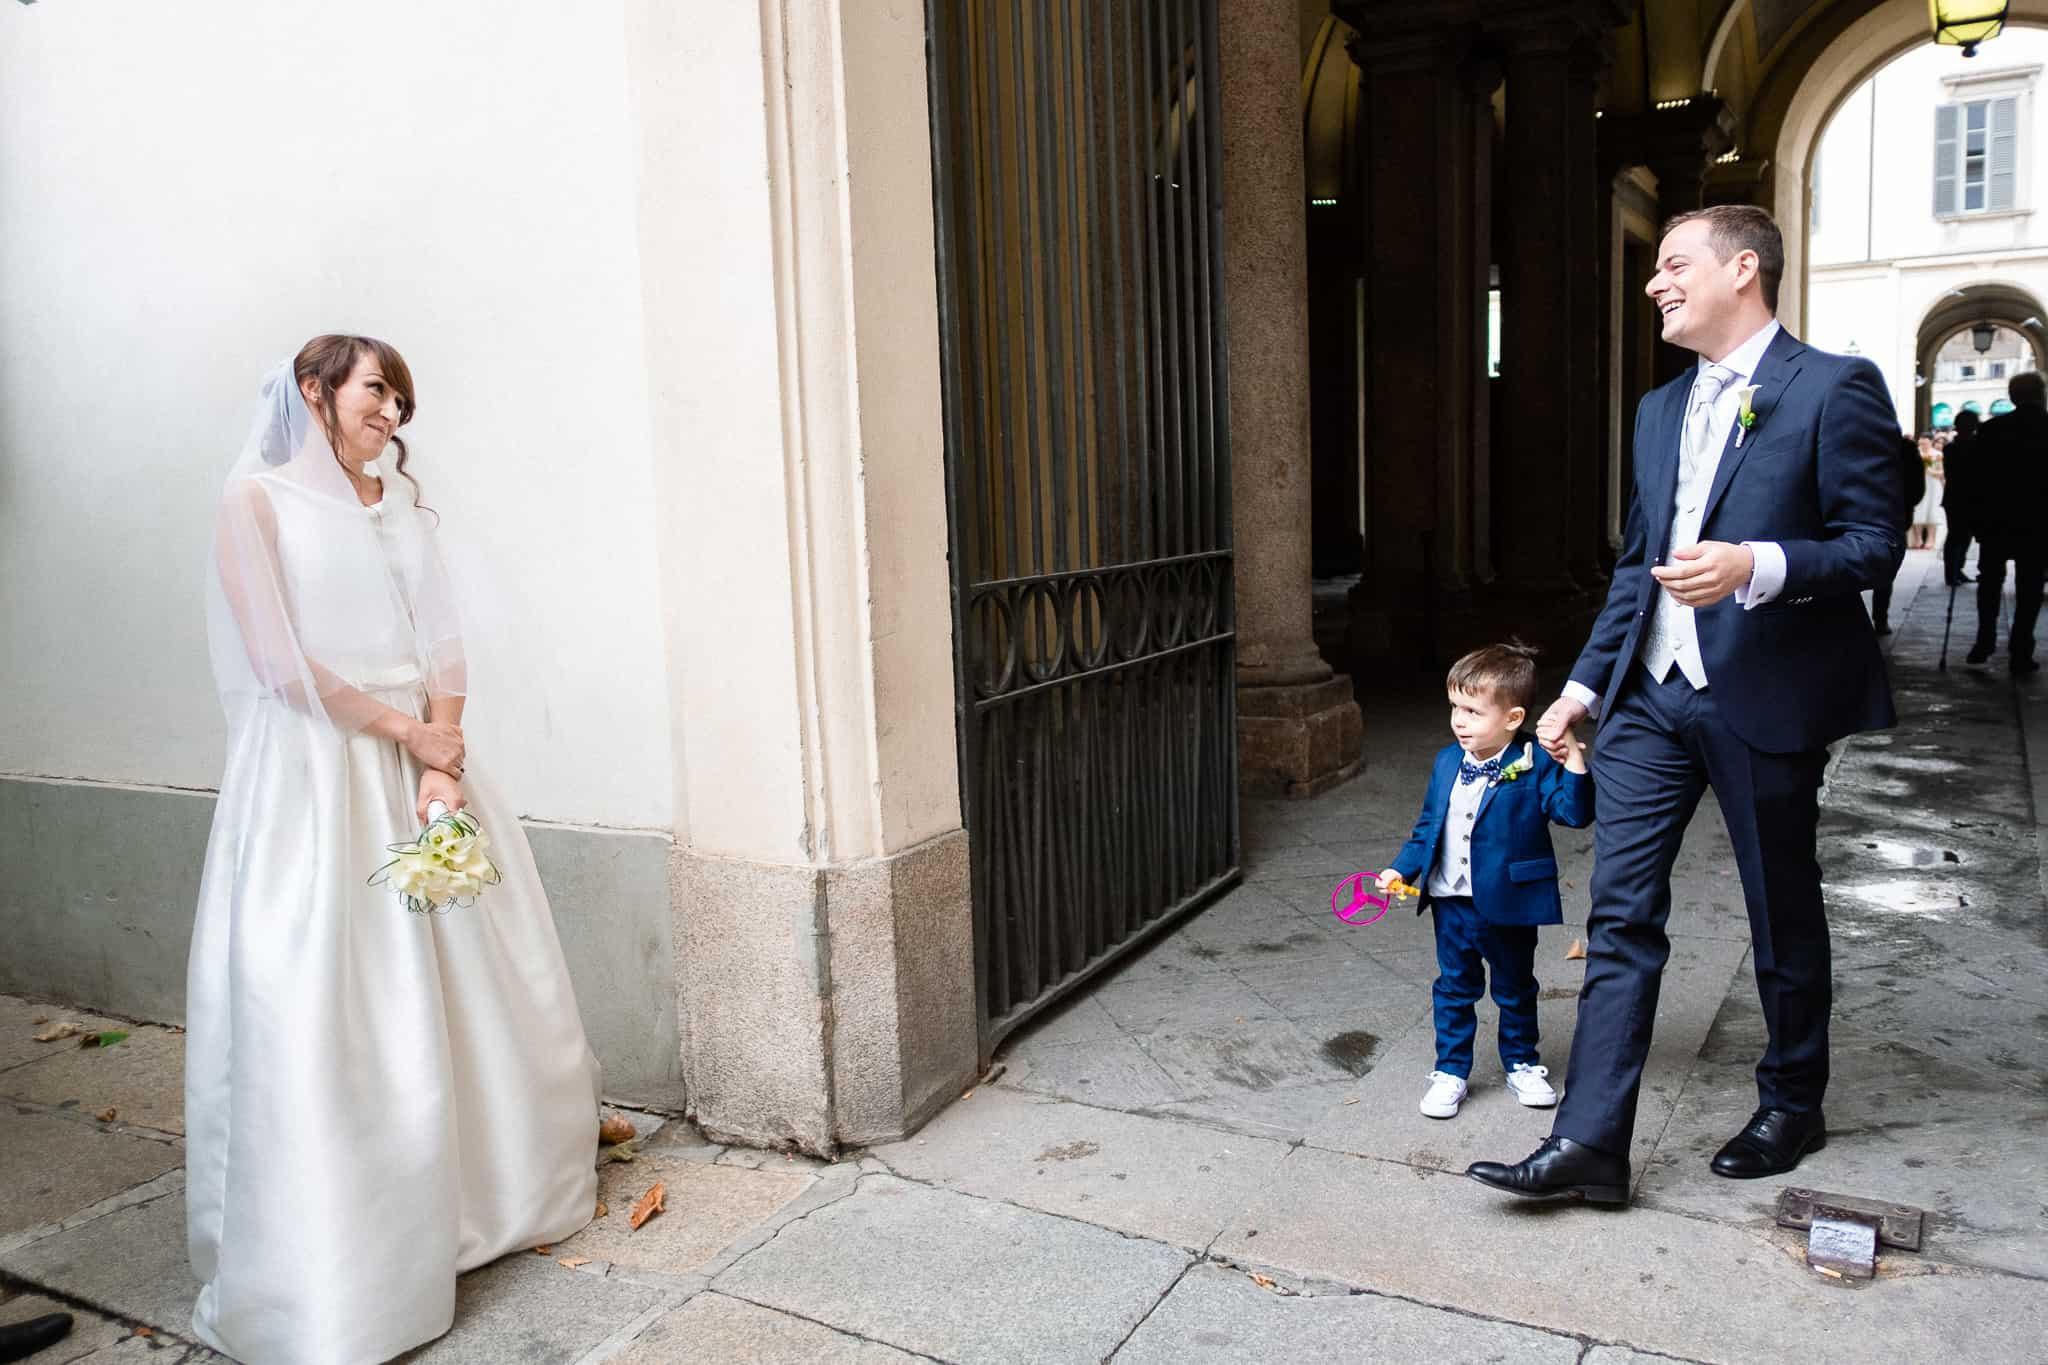 matrimonio Canter Milano San siro Luca rossi wedding reportage 0026